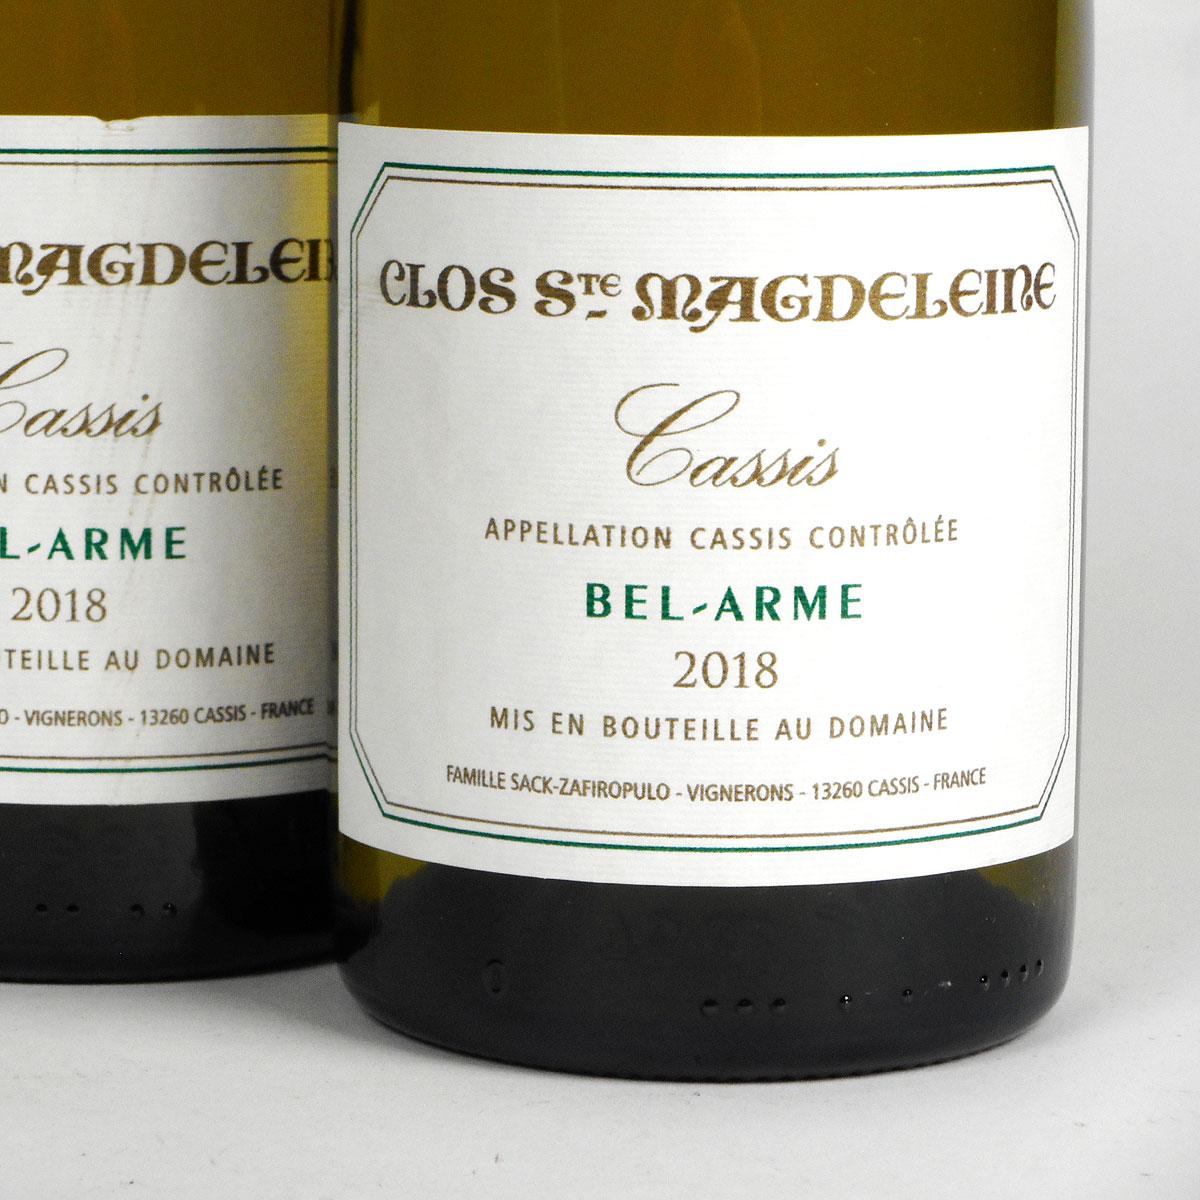 Cassis: Clos Sainte Magdeleine 'Bel-Arme' Blanc 2018